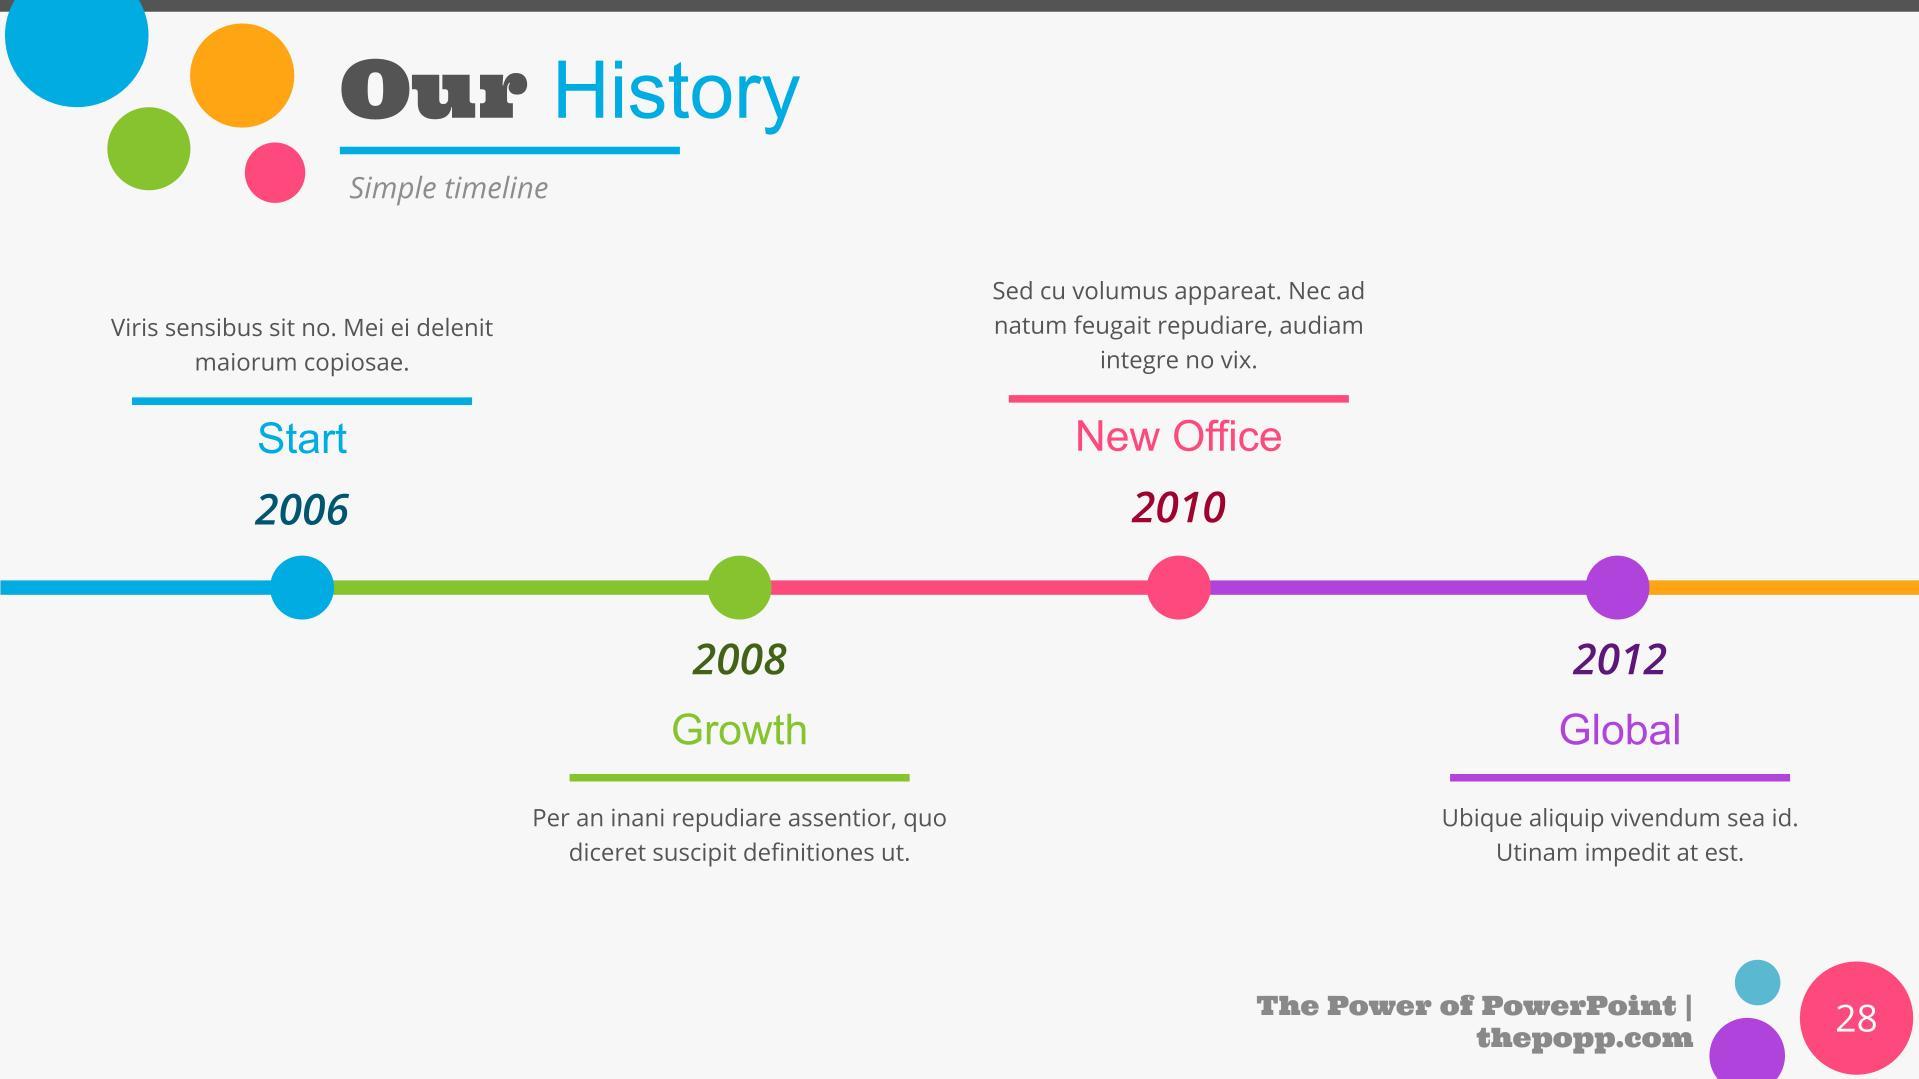 An alternative variant of the color timeline.